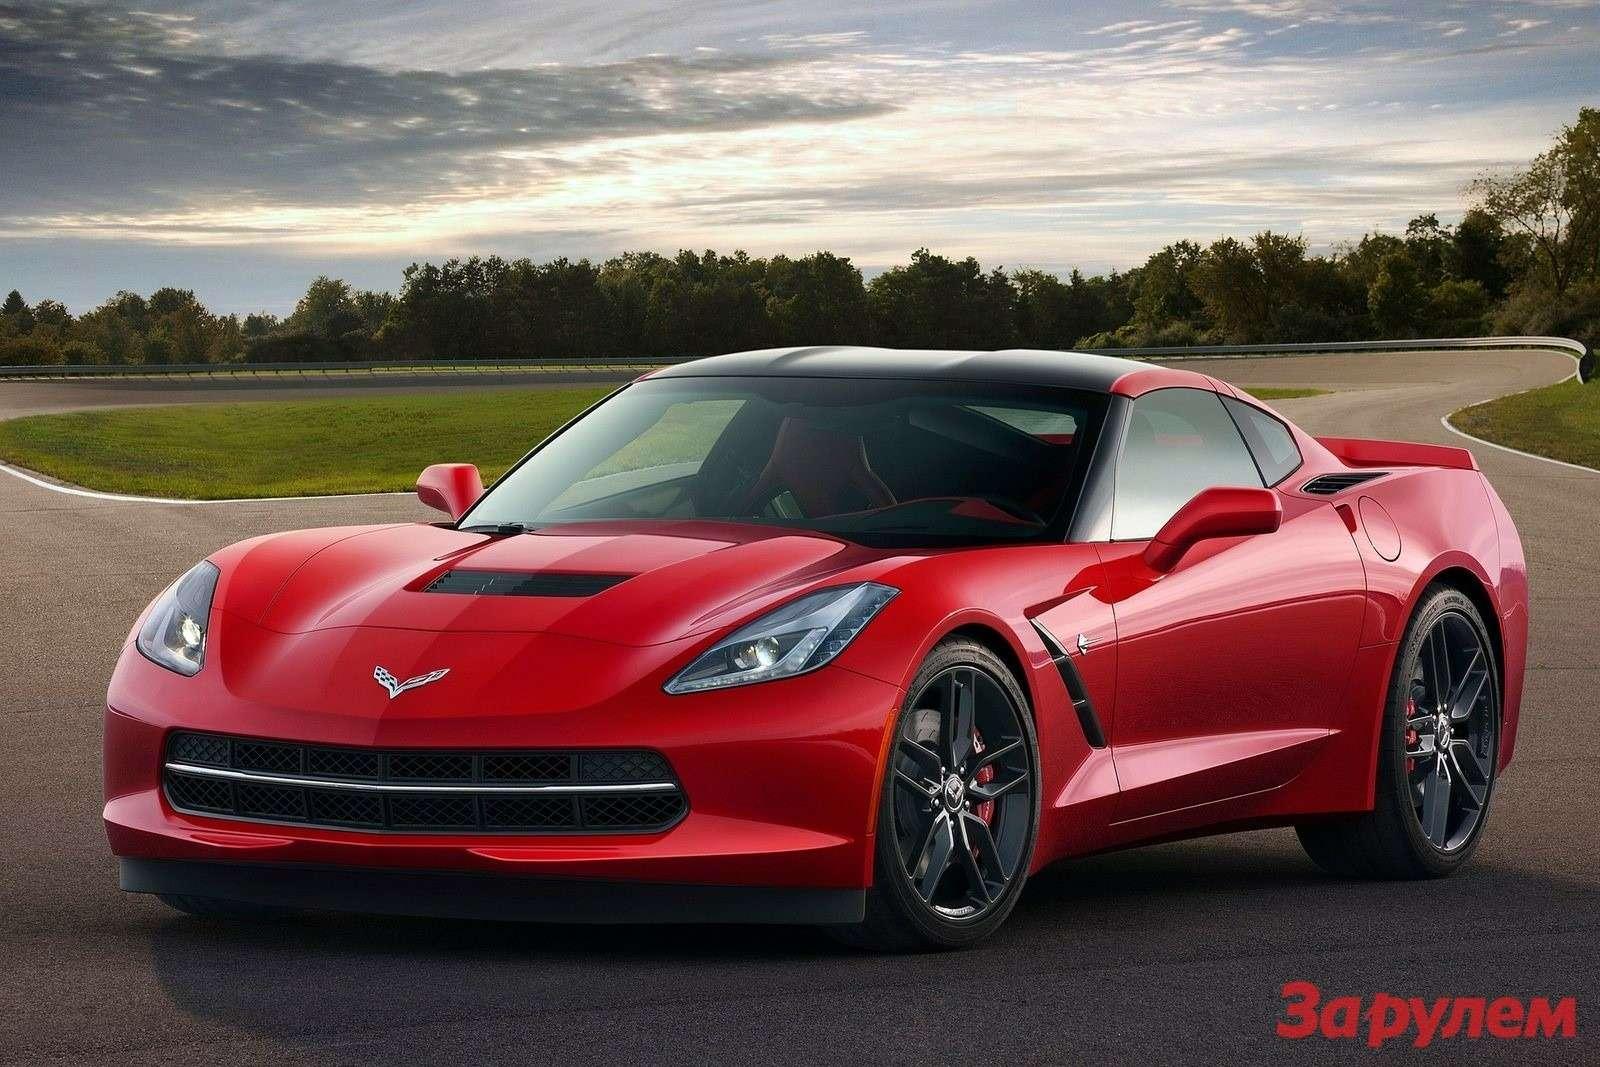 Chevrolet-Corvette_C7_Stingray_2014_1600x1200_wallpaper_03